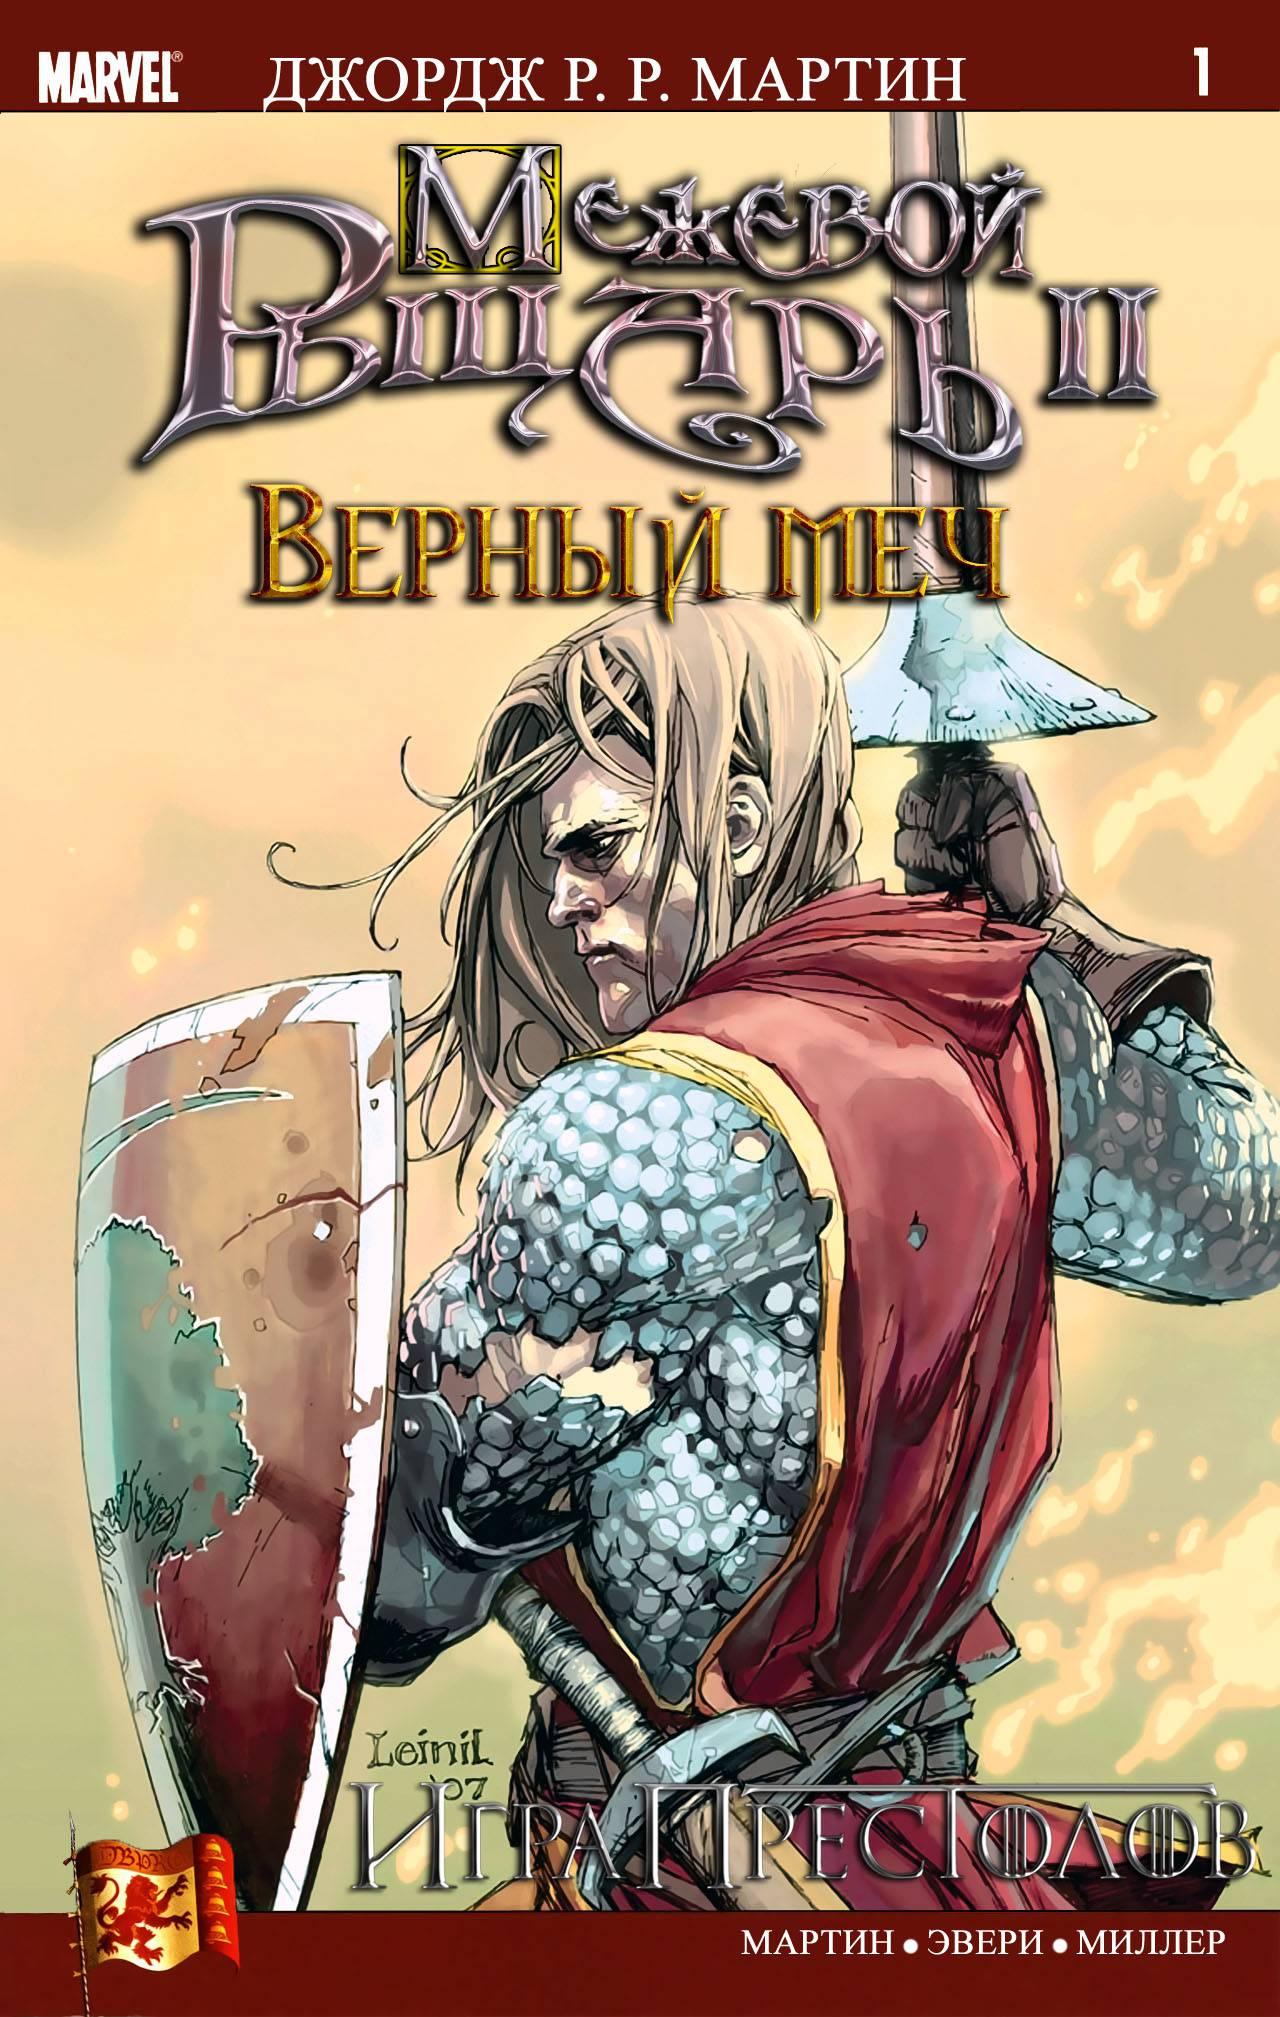 Межевой Рыцарь II: Верный Меч №1 онлайн